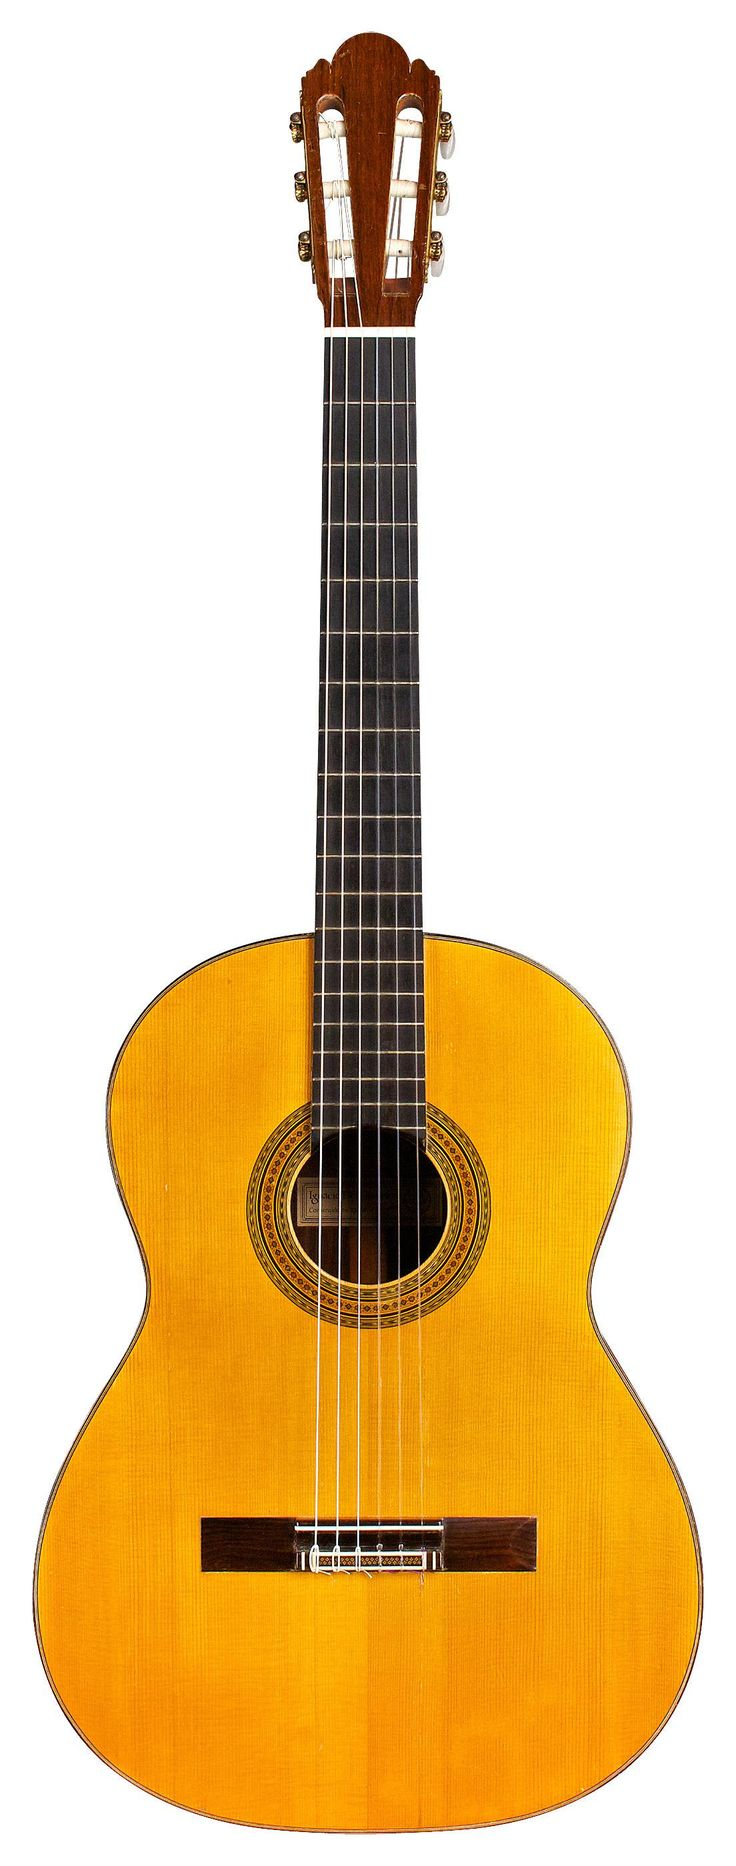 Classical Guitars - 1960 Ignacio Fleta SP/CSAR - Guitar Salon International